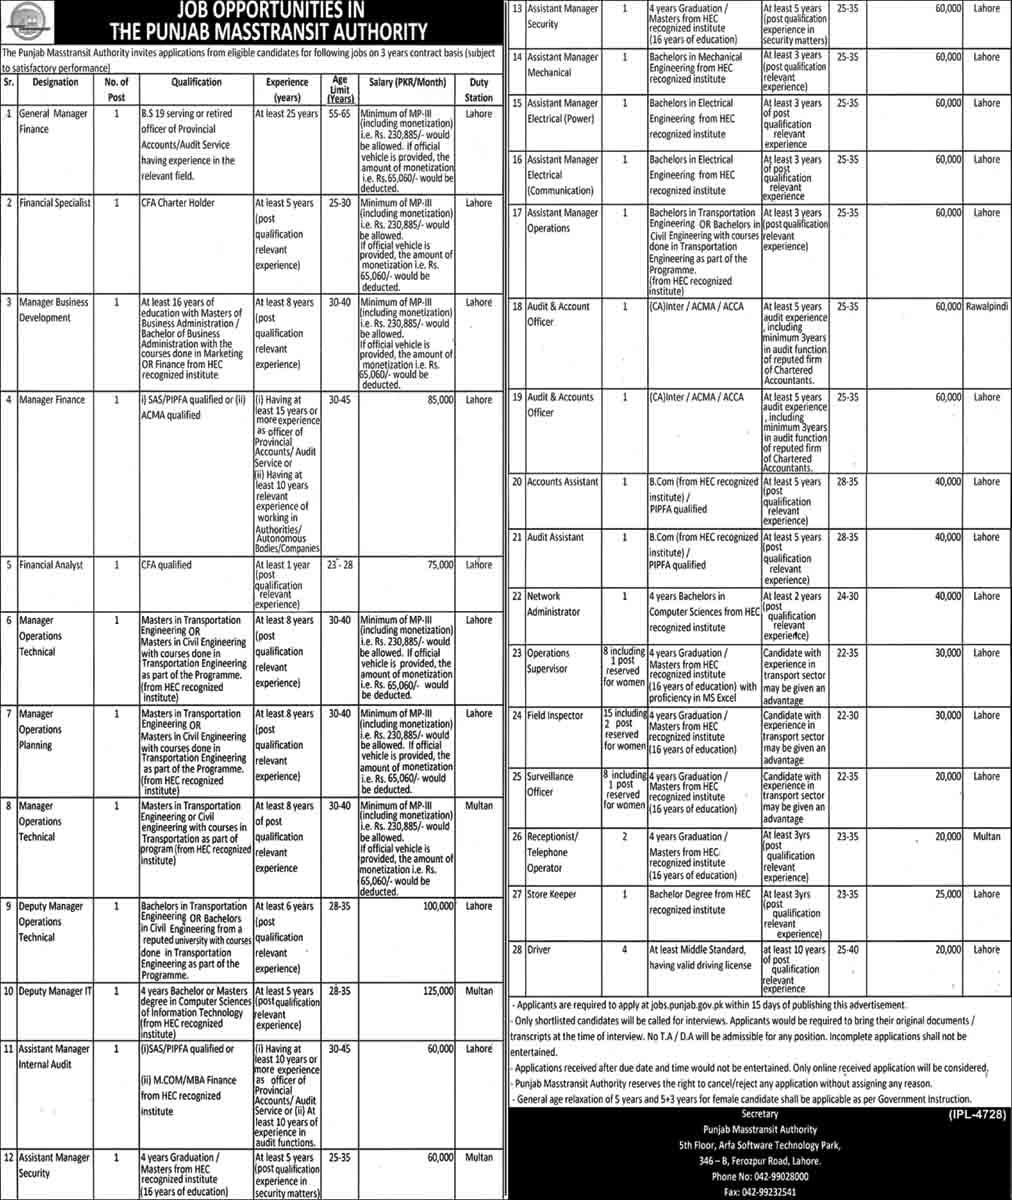 Punjab Masstransit Authority (PMA) Jobs May 2021 (60 Posts)